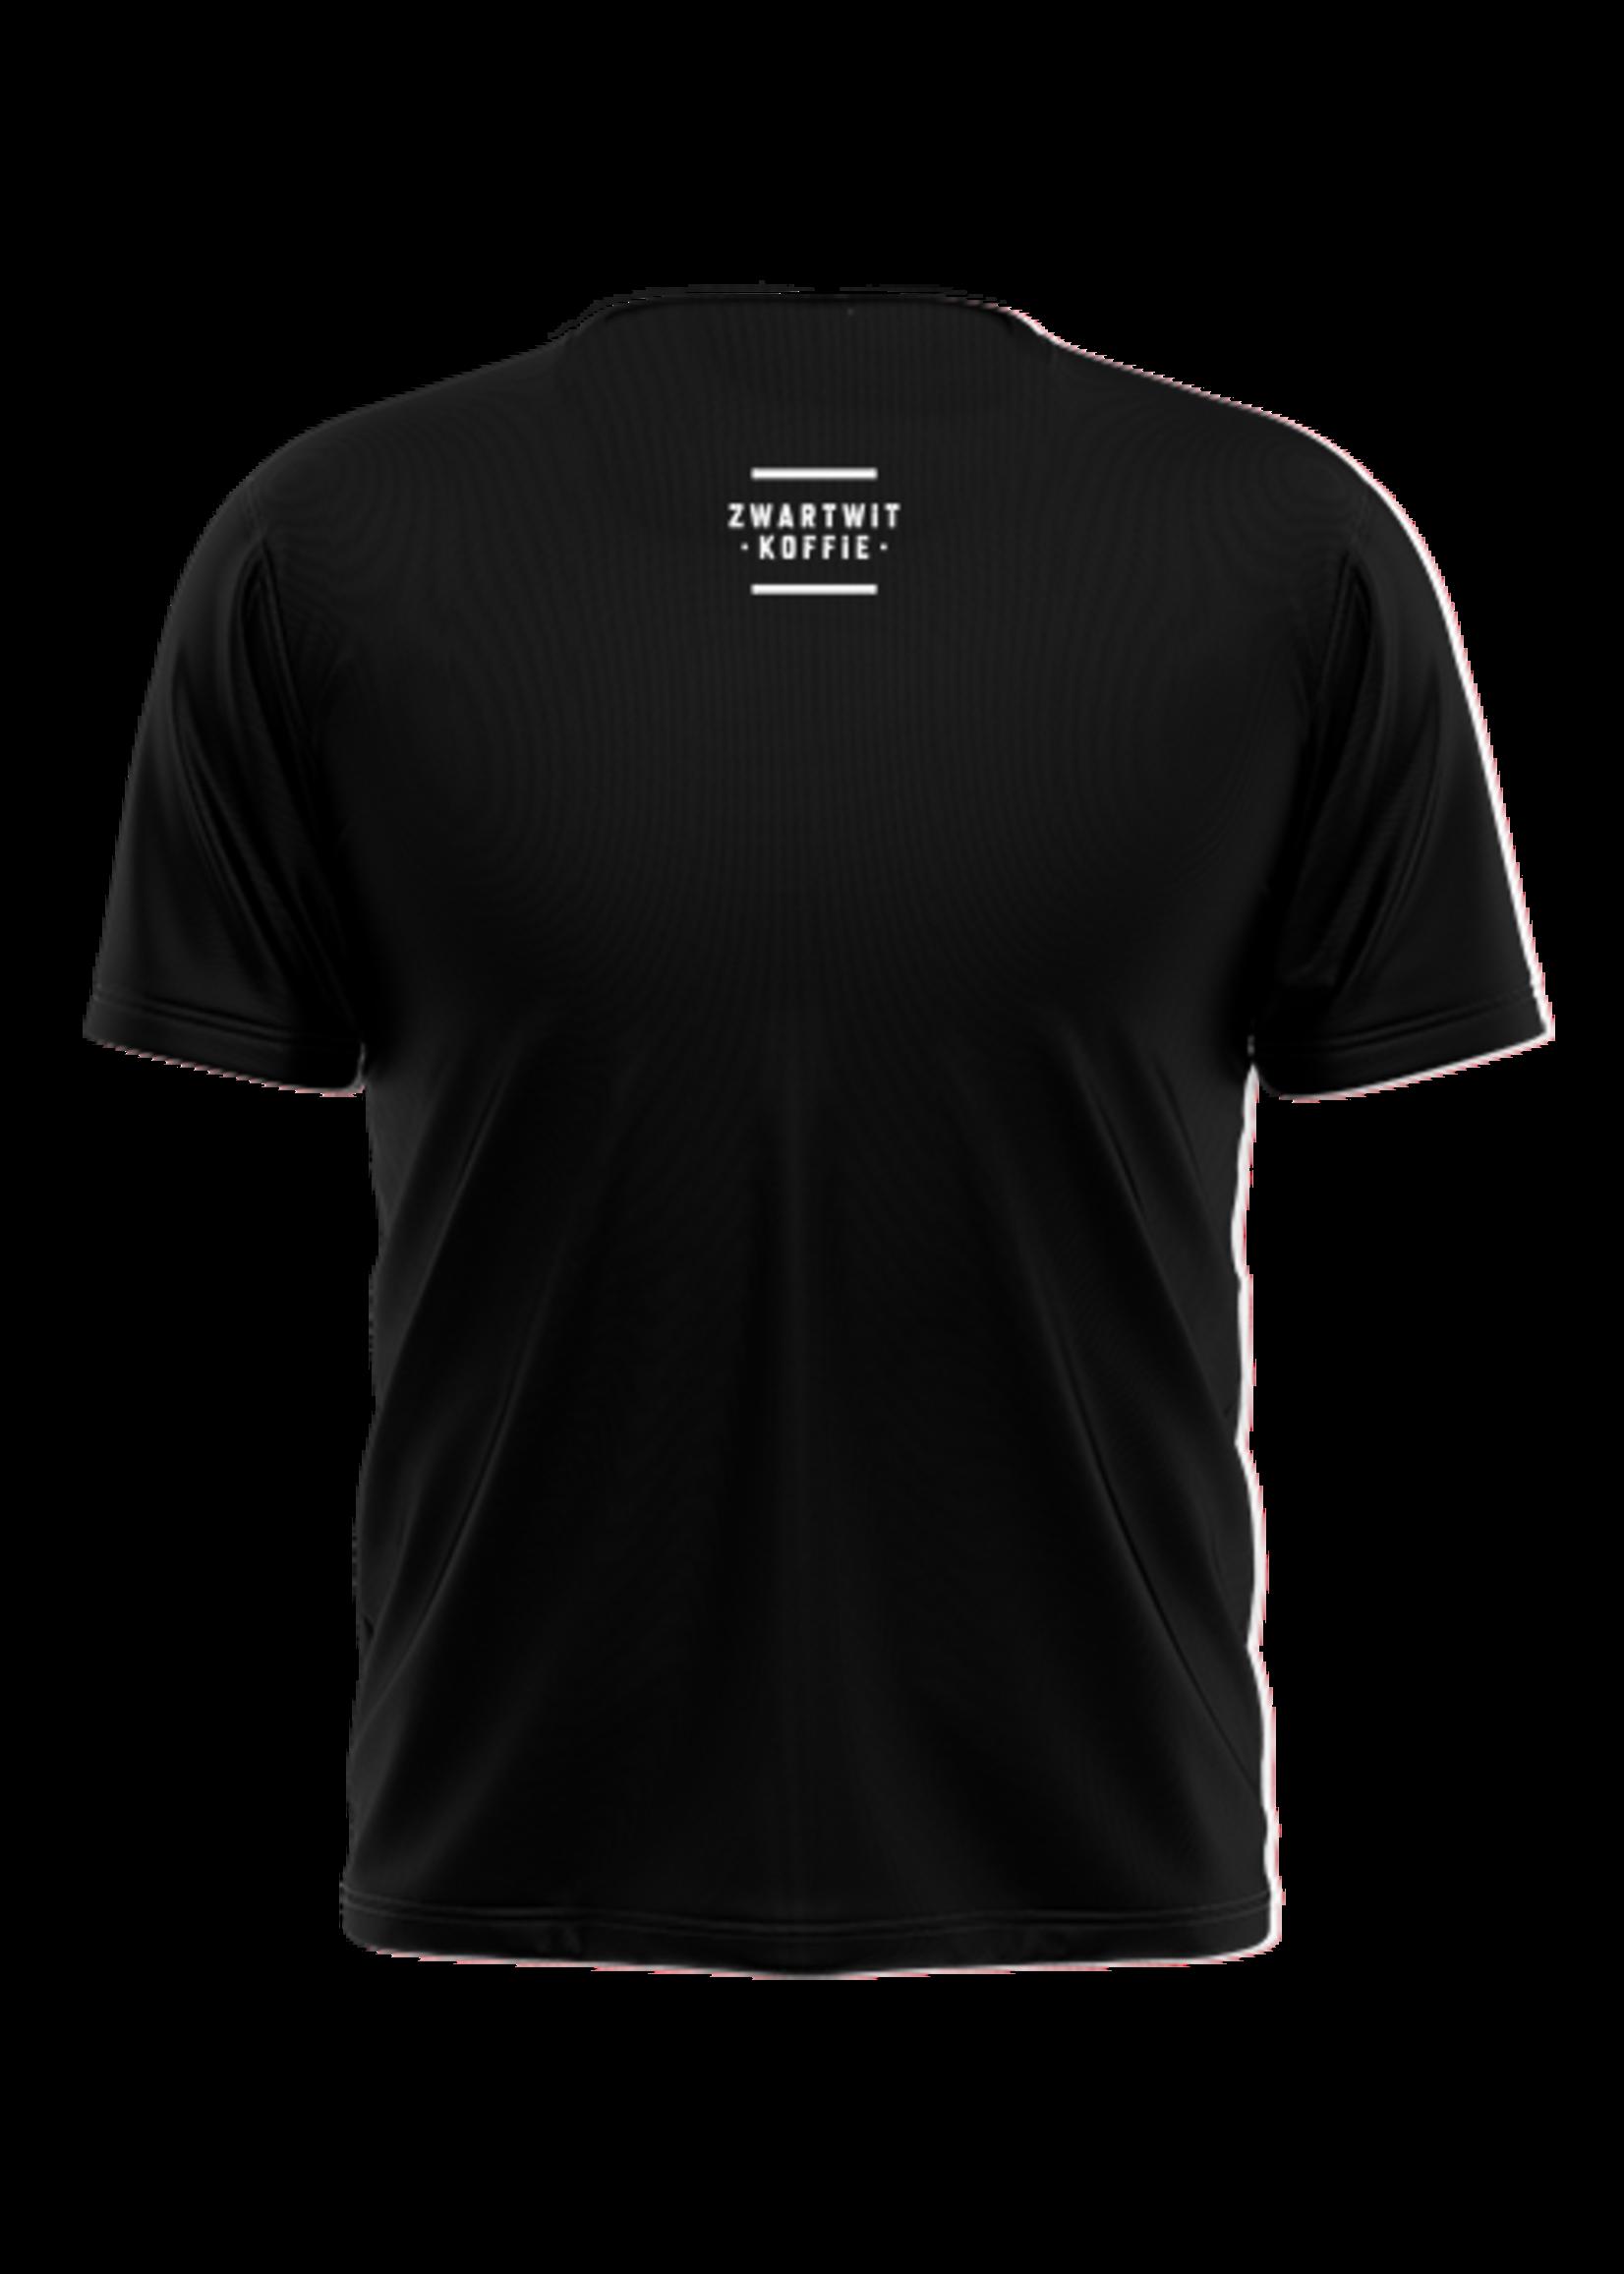 Rebel & Dutch ZwartWit T-shirt grey white